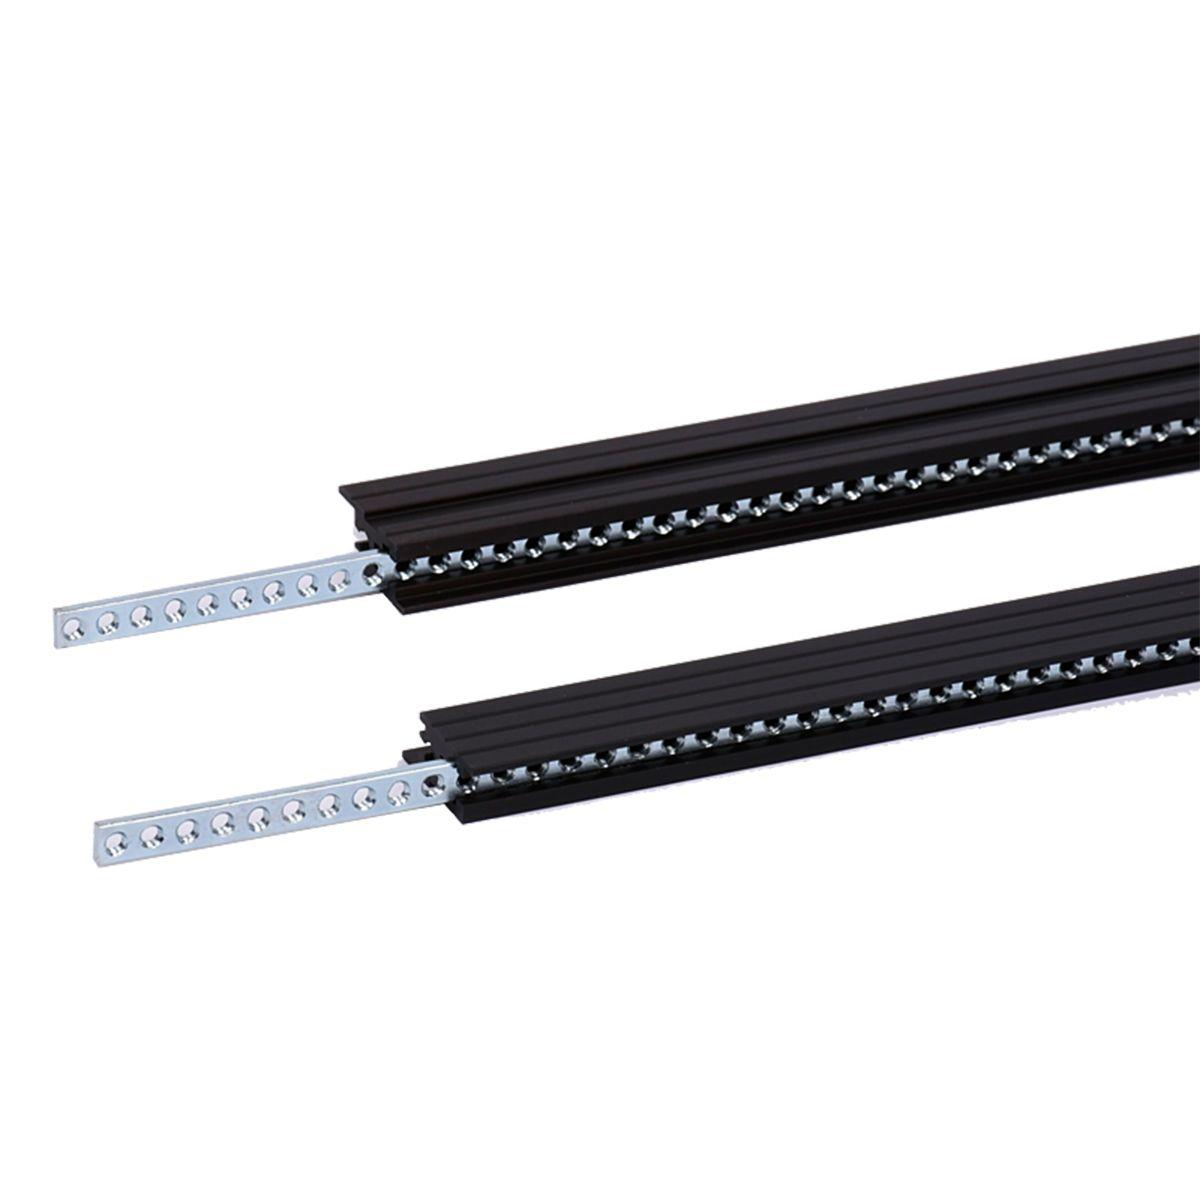 TipTop Audio Z-Rails 104HP Eurorack Mounting Rails - Black (Pair)